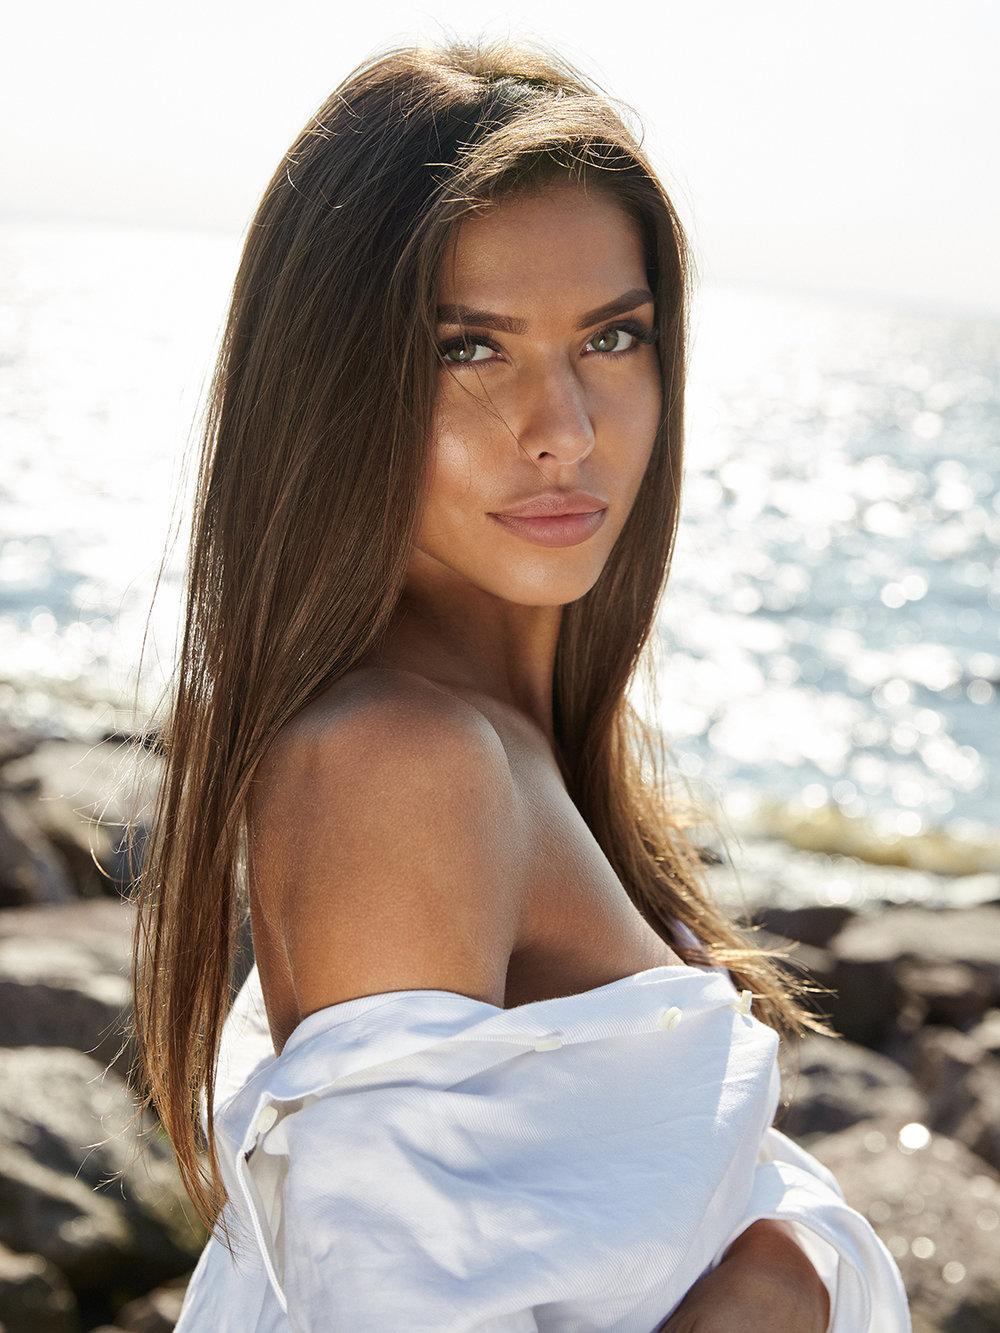 13b3f87f338b-ph_olga_firfarova_model_katerina_sozinova, model citizen magazine.jpg